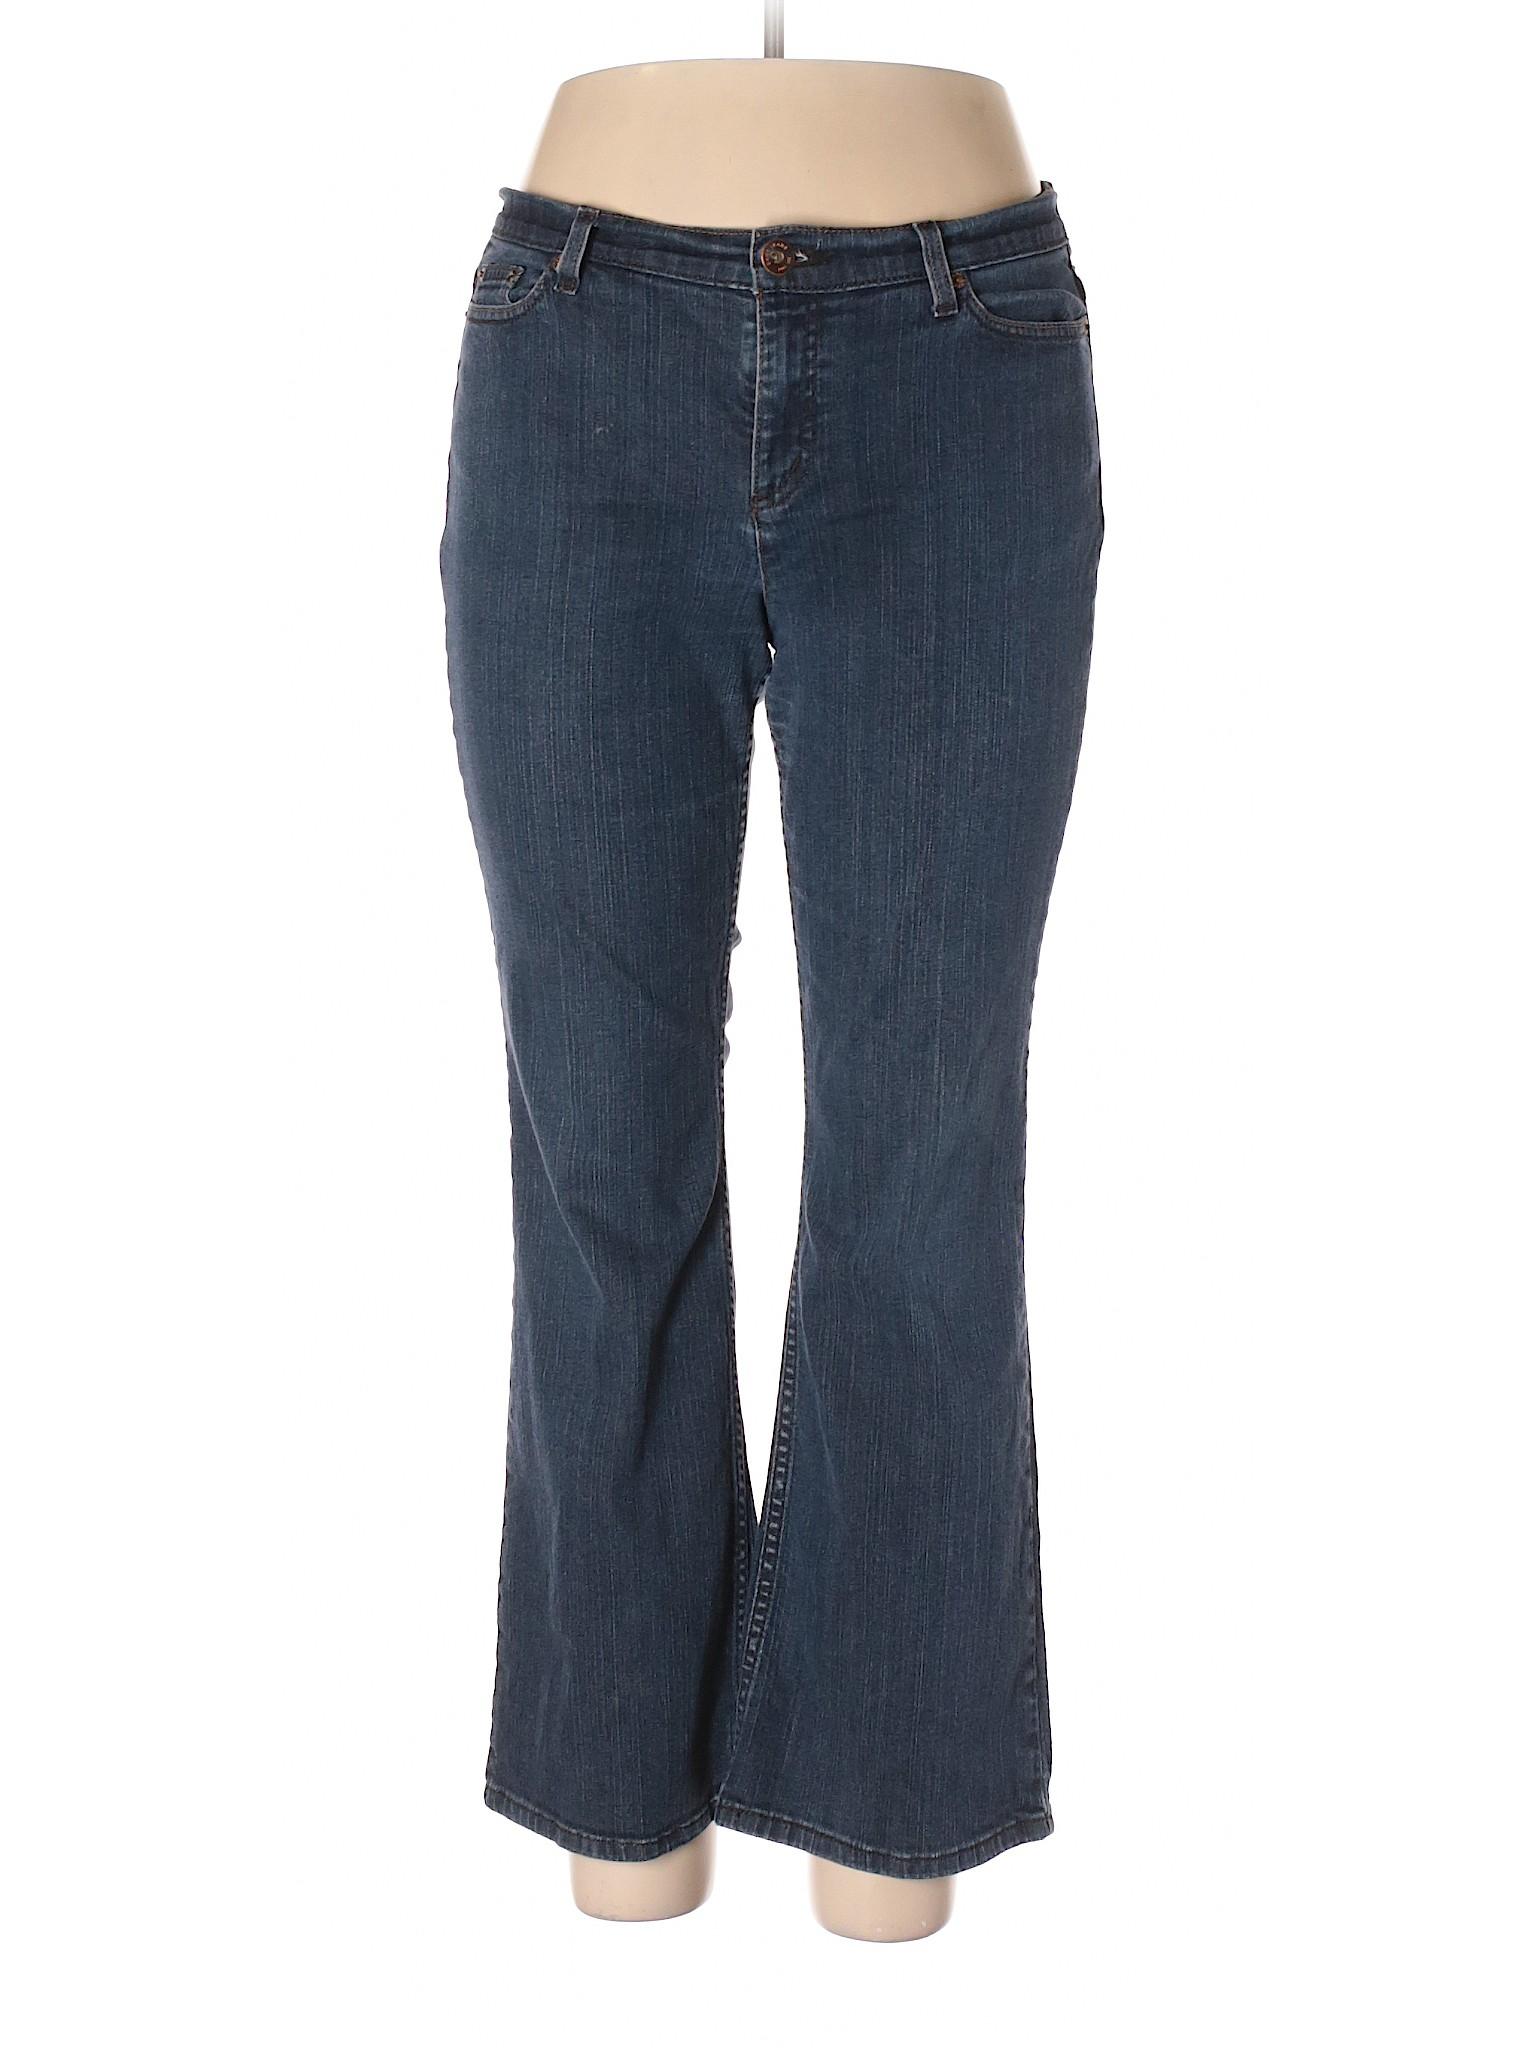 DKNY Promotion DKNY Jeans Promotion BzEa6Eqpw